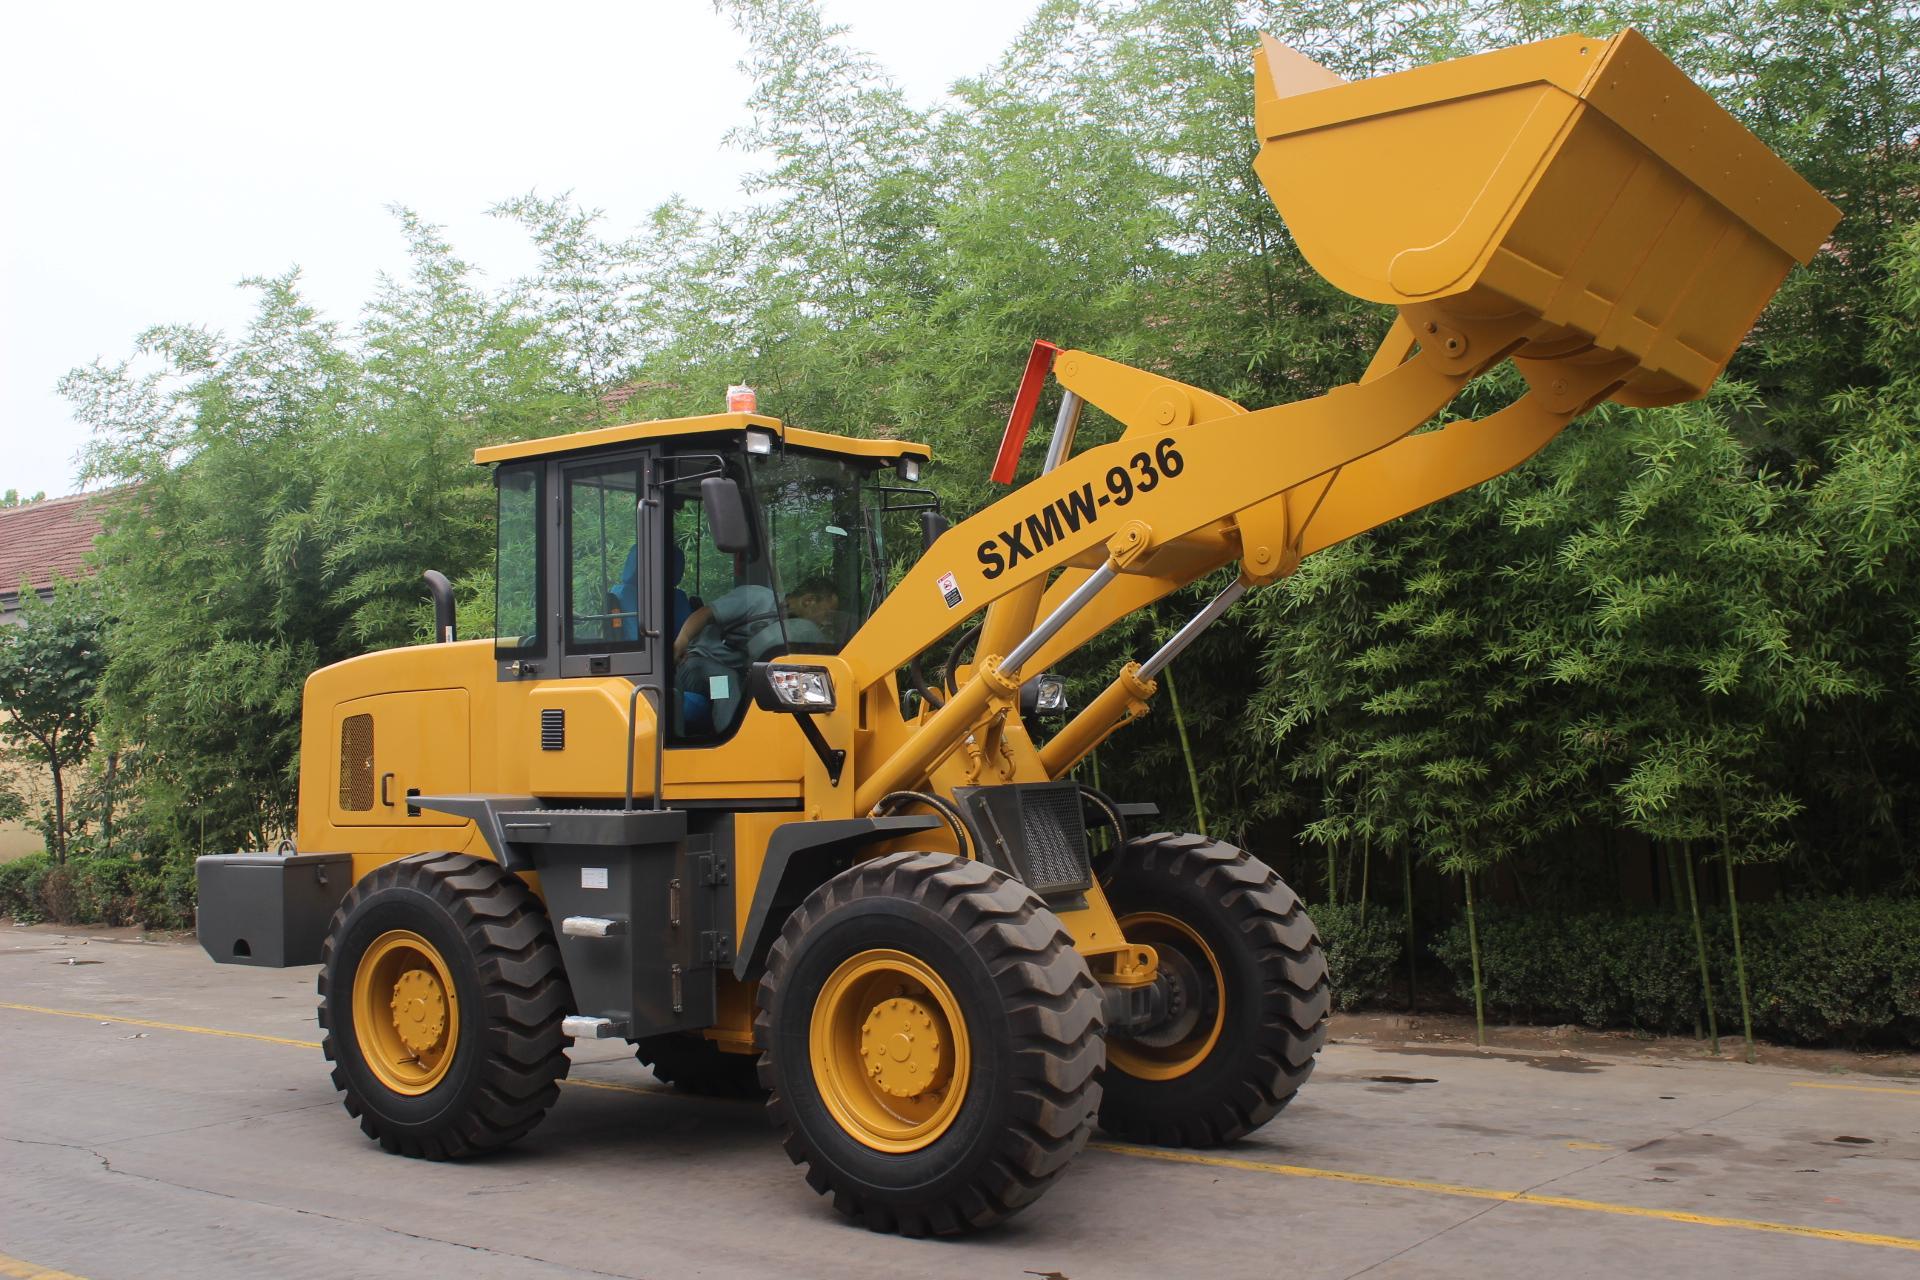 SXMW936 front loader and bucket loader for sale 1